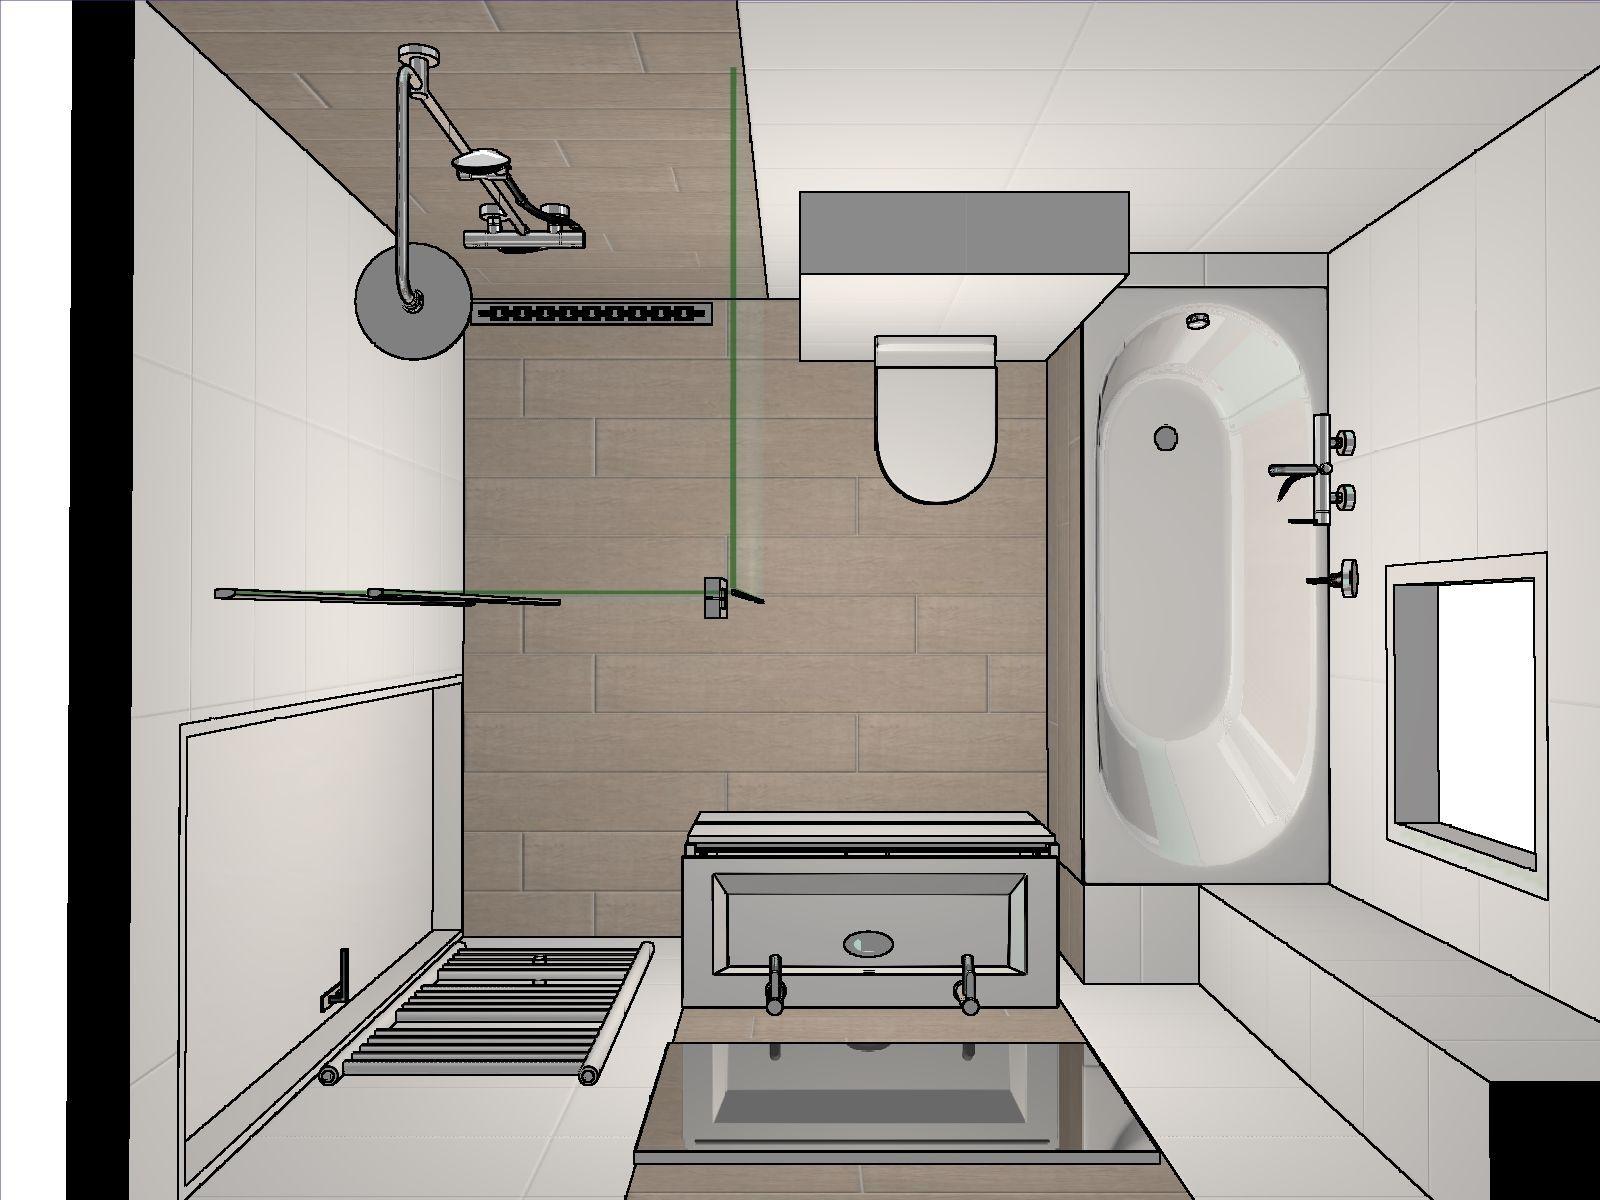 Small Basement Bathroom W Shower Badezimmer Klein Badezimmer Im Keller Keller Badezimmer Ideen